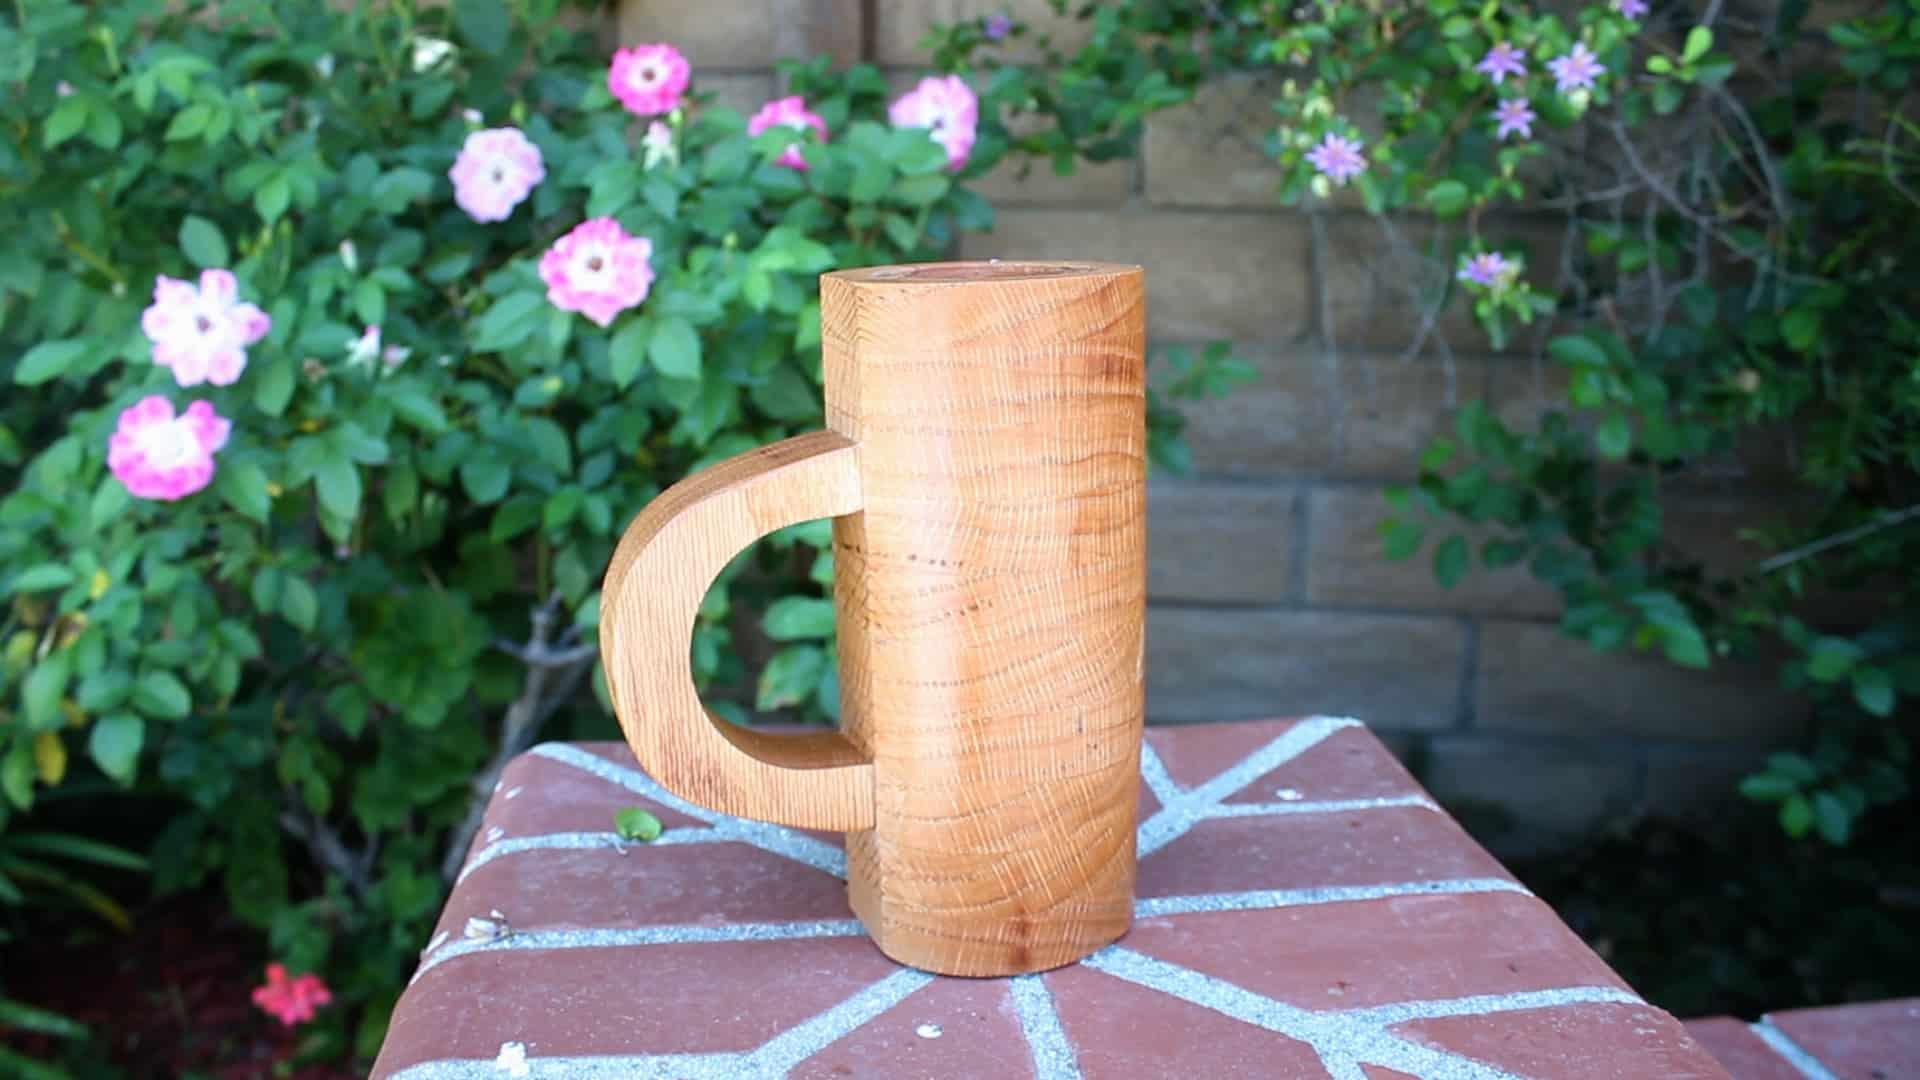 DIY Wooden Beer Mug (No Lathe)